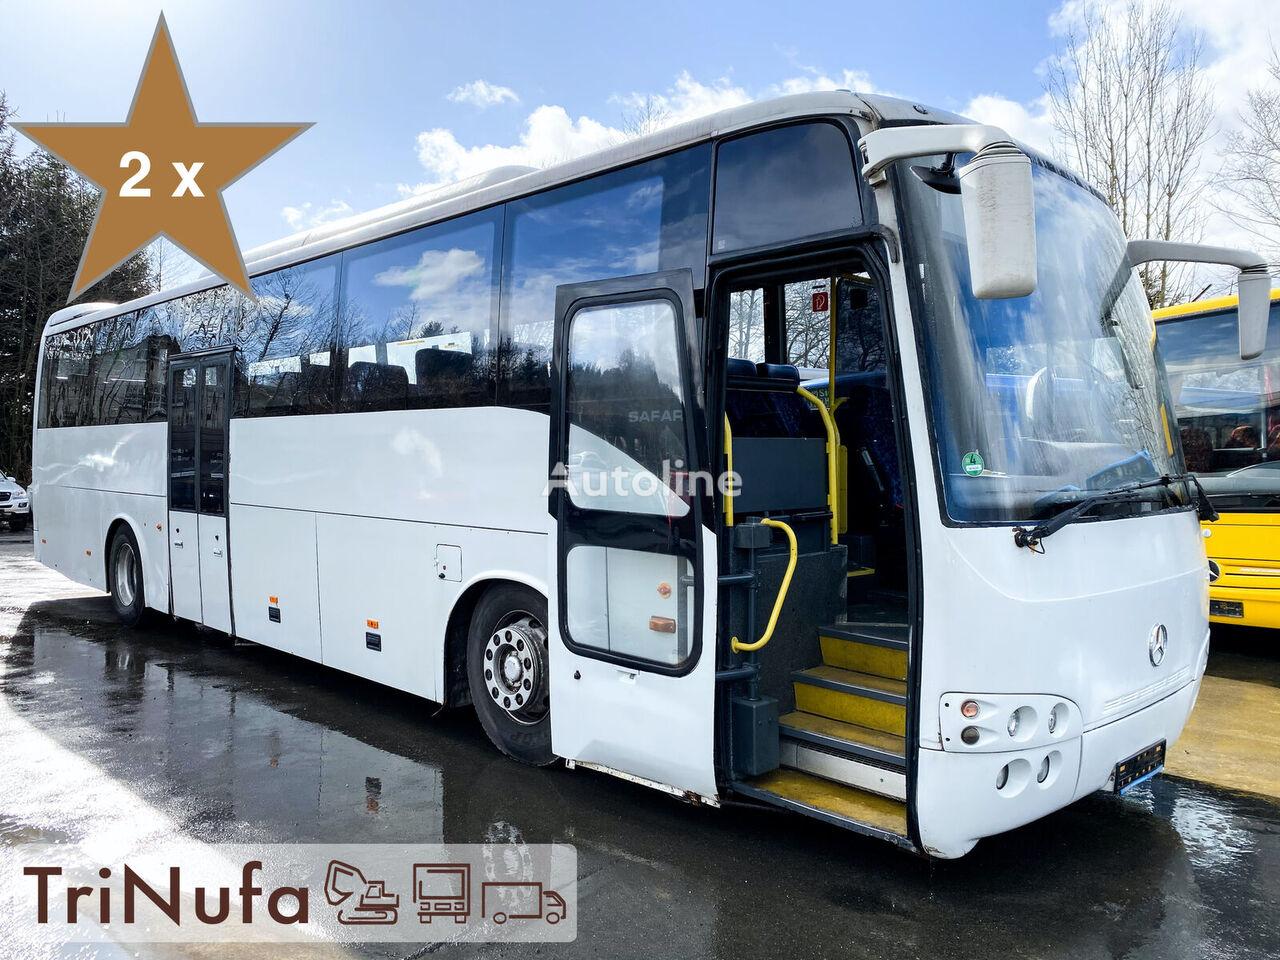 MERCEDES-BENZ 18.36 Safari   Euro 4   Klima   Retarder   WC   távolsági busz